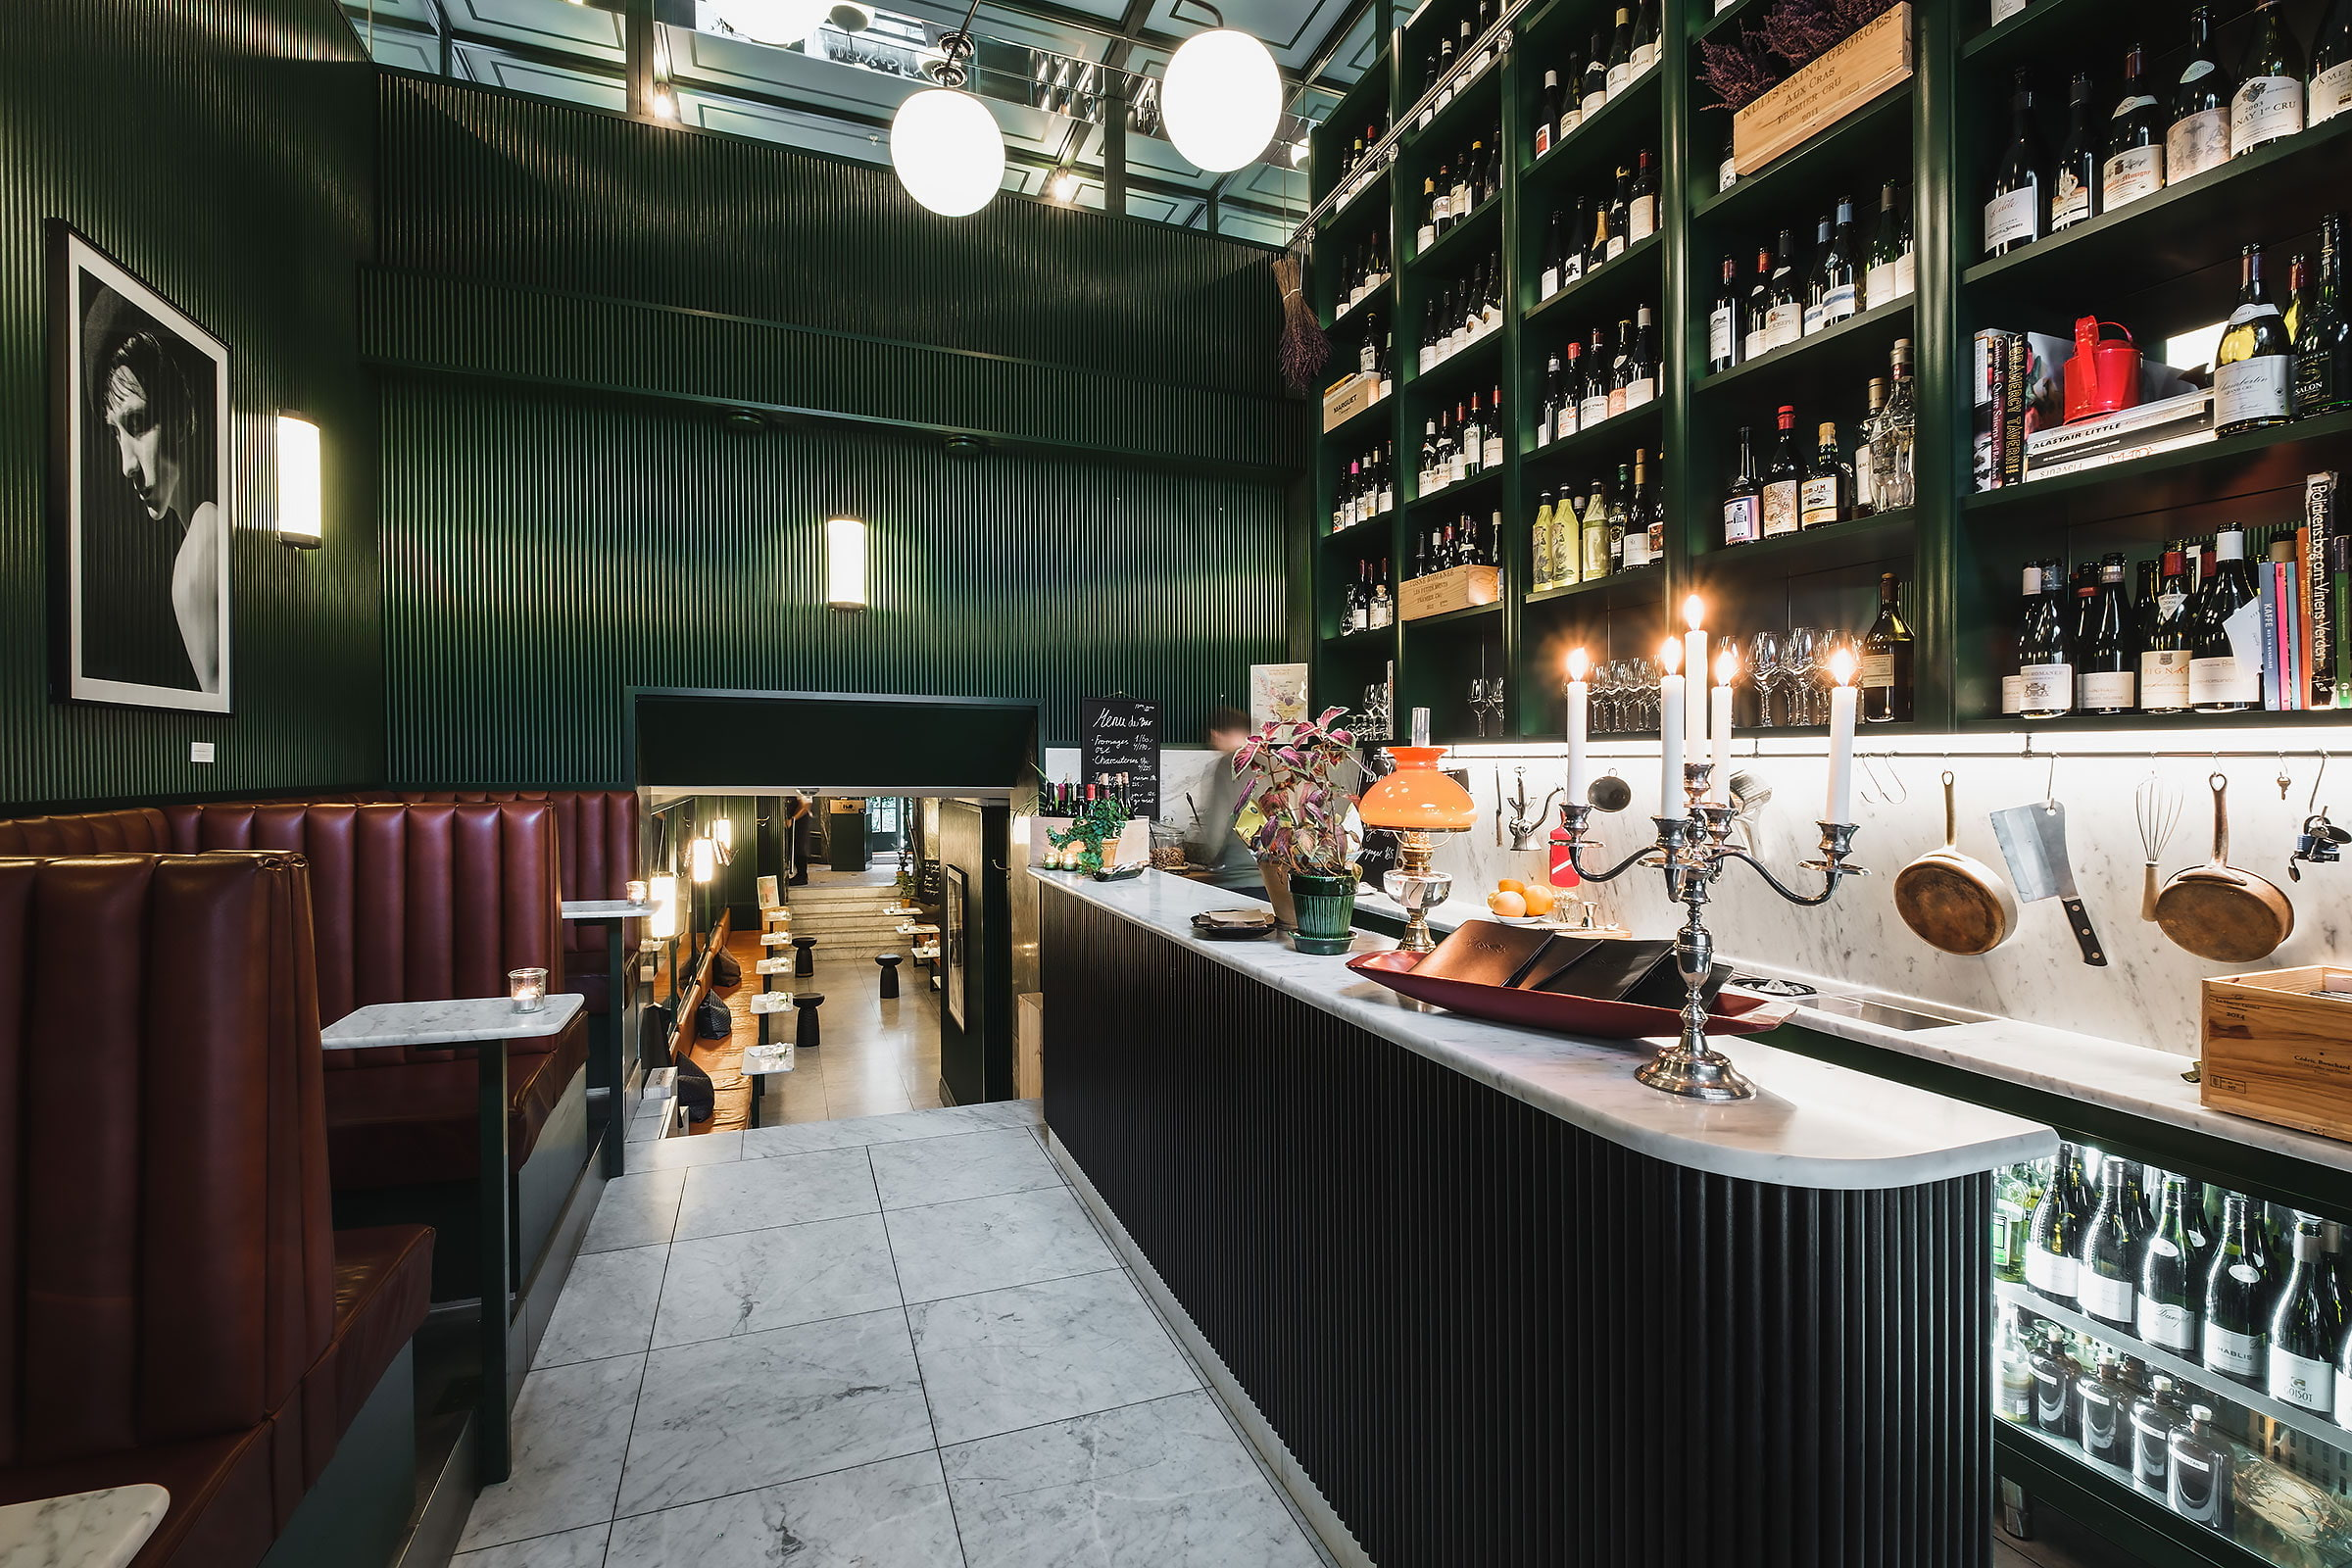 The Sparrow Wine Bar & Bistro